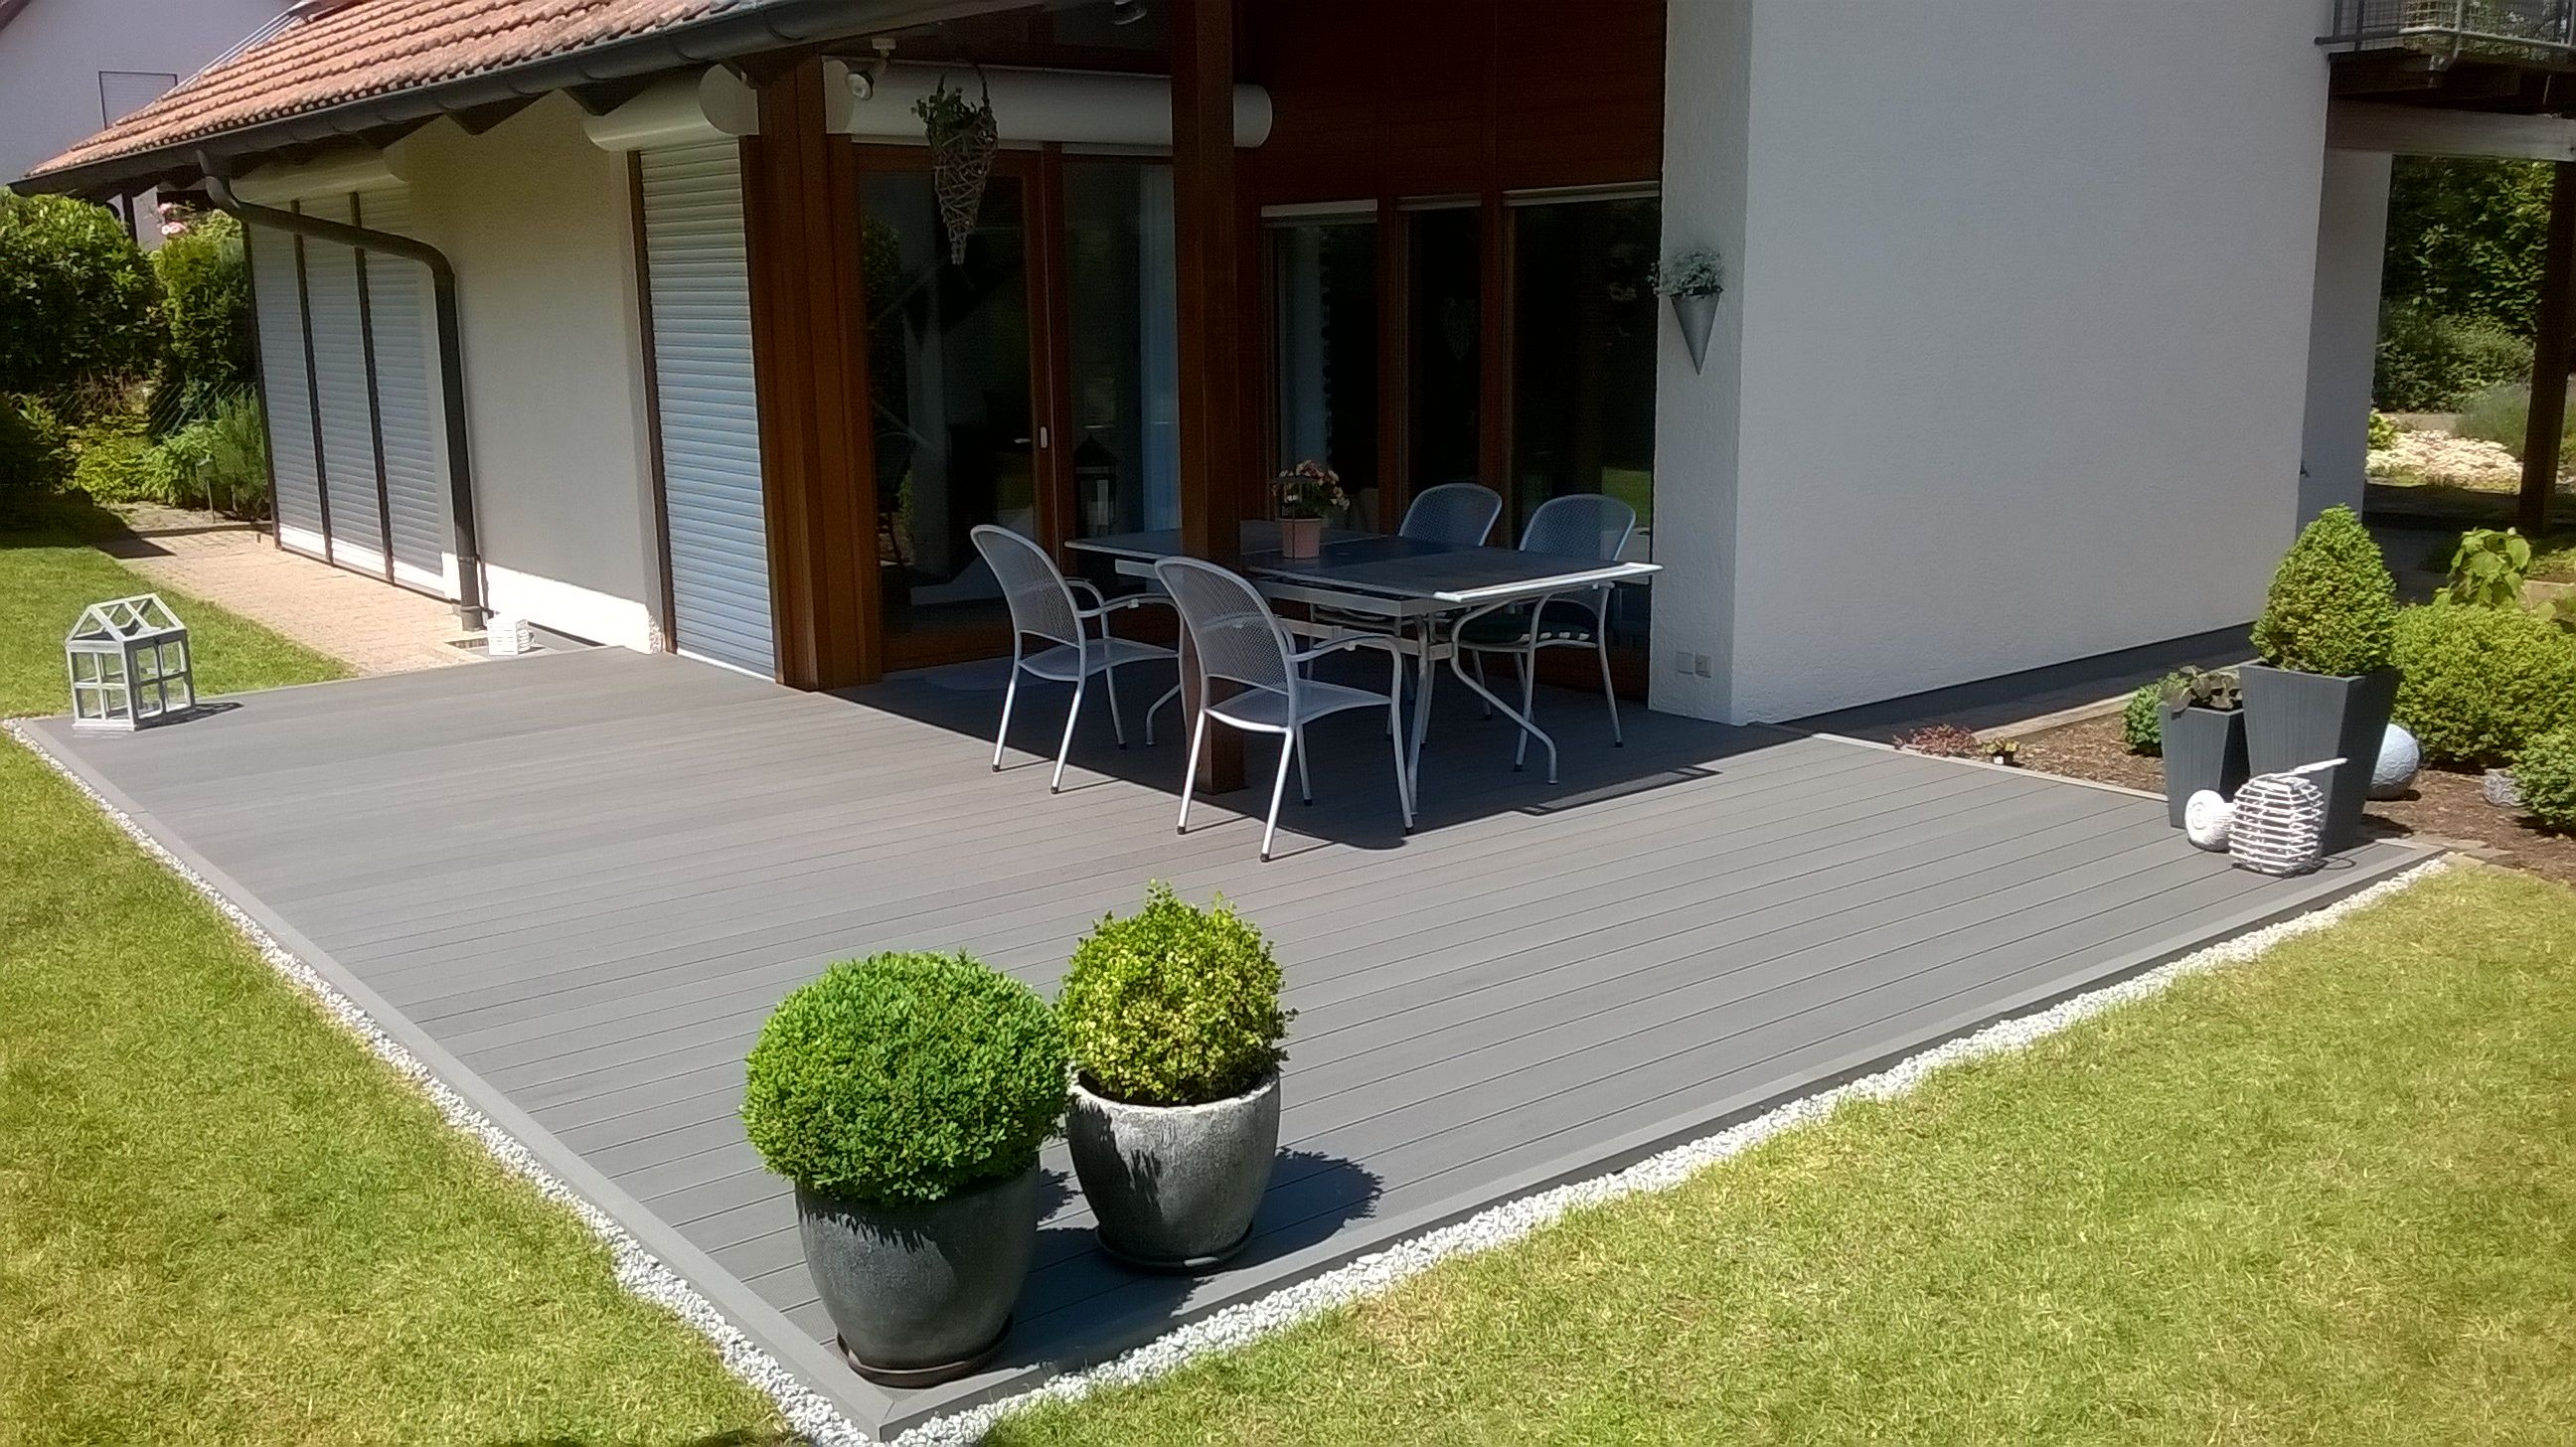 Mondesi Wpc wooden plastic pavement flooring for sale waterproof wpc flooring